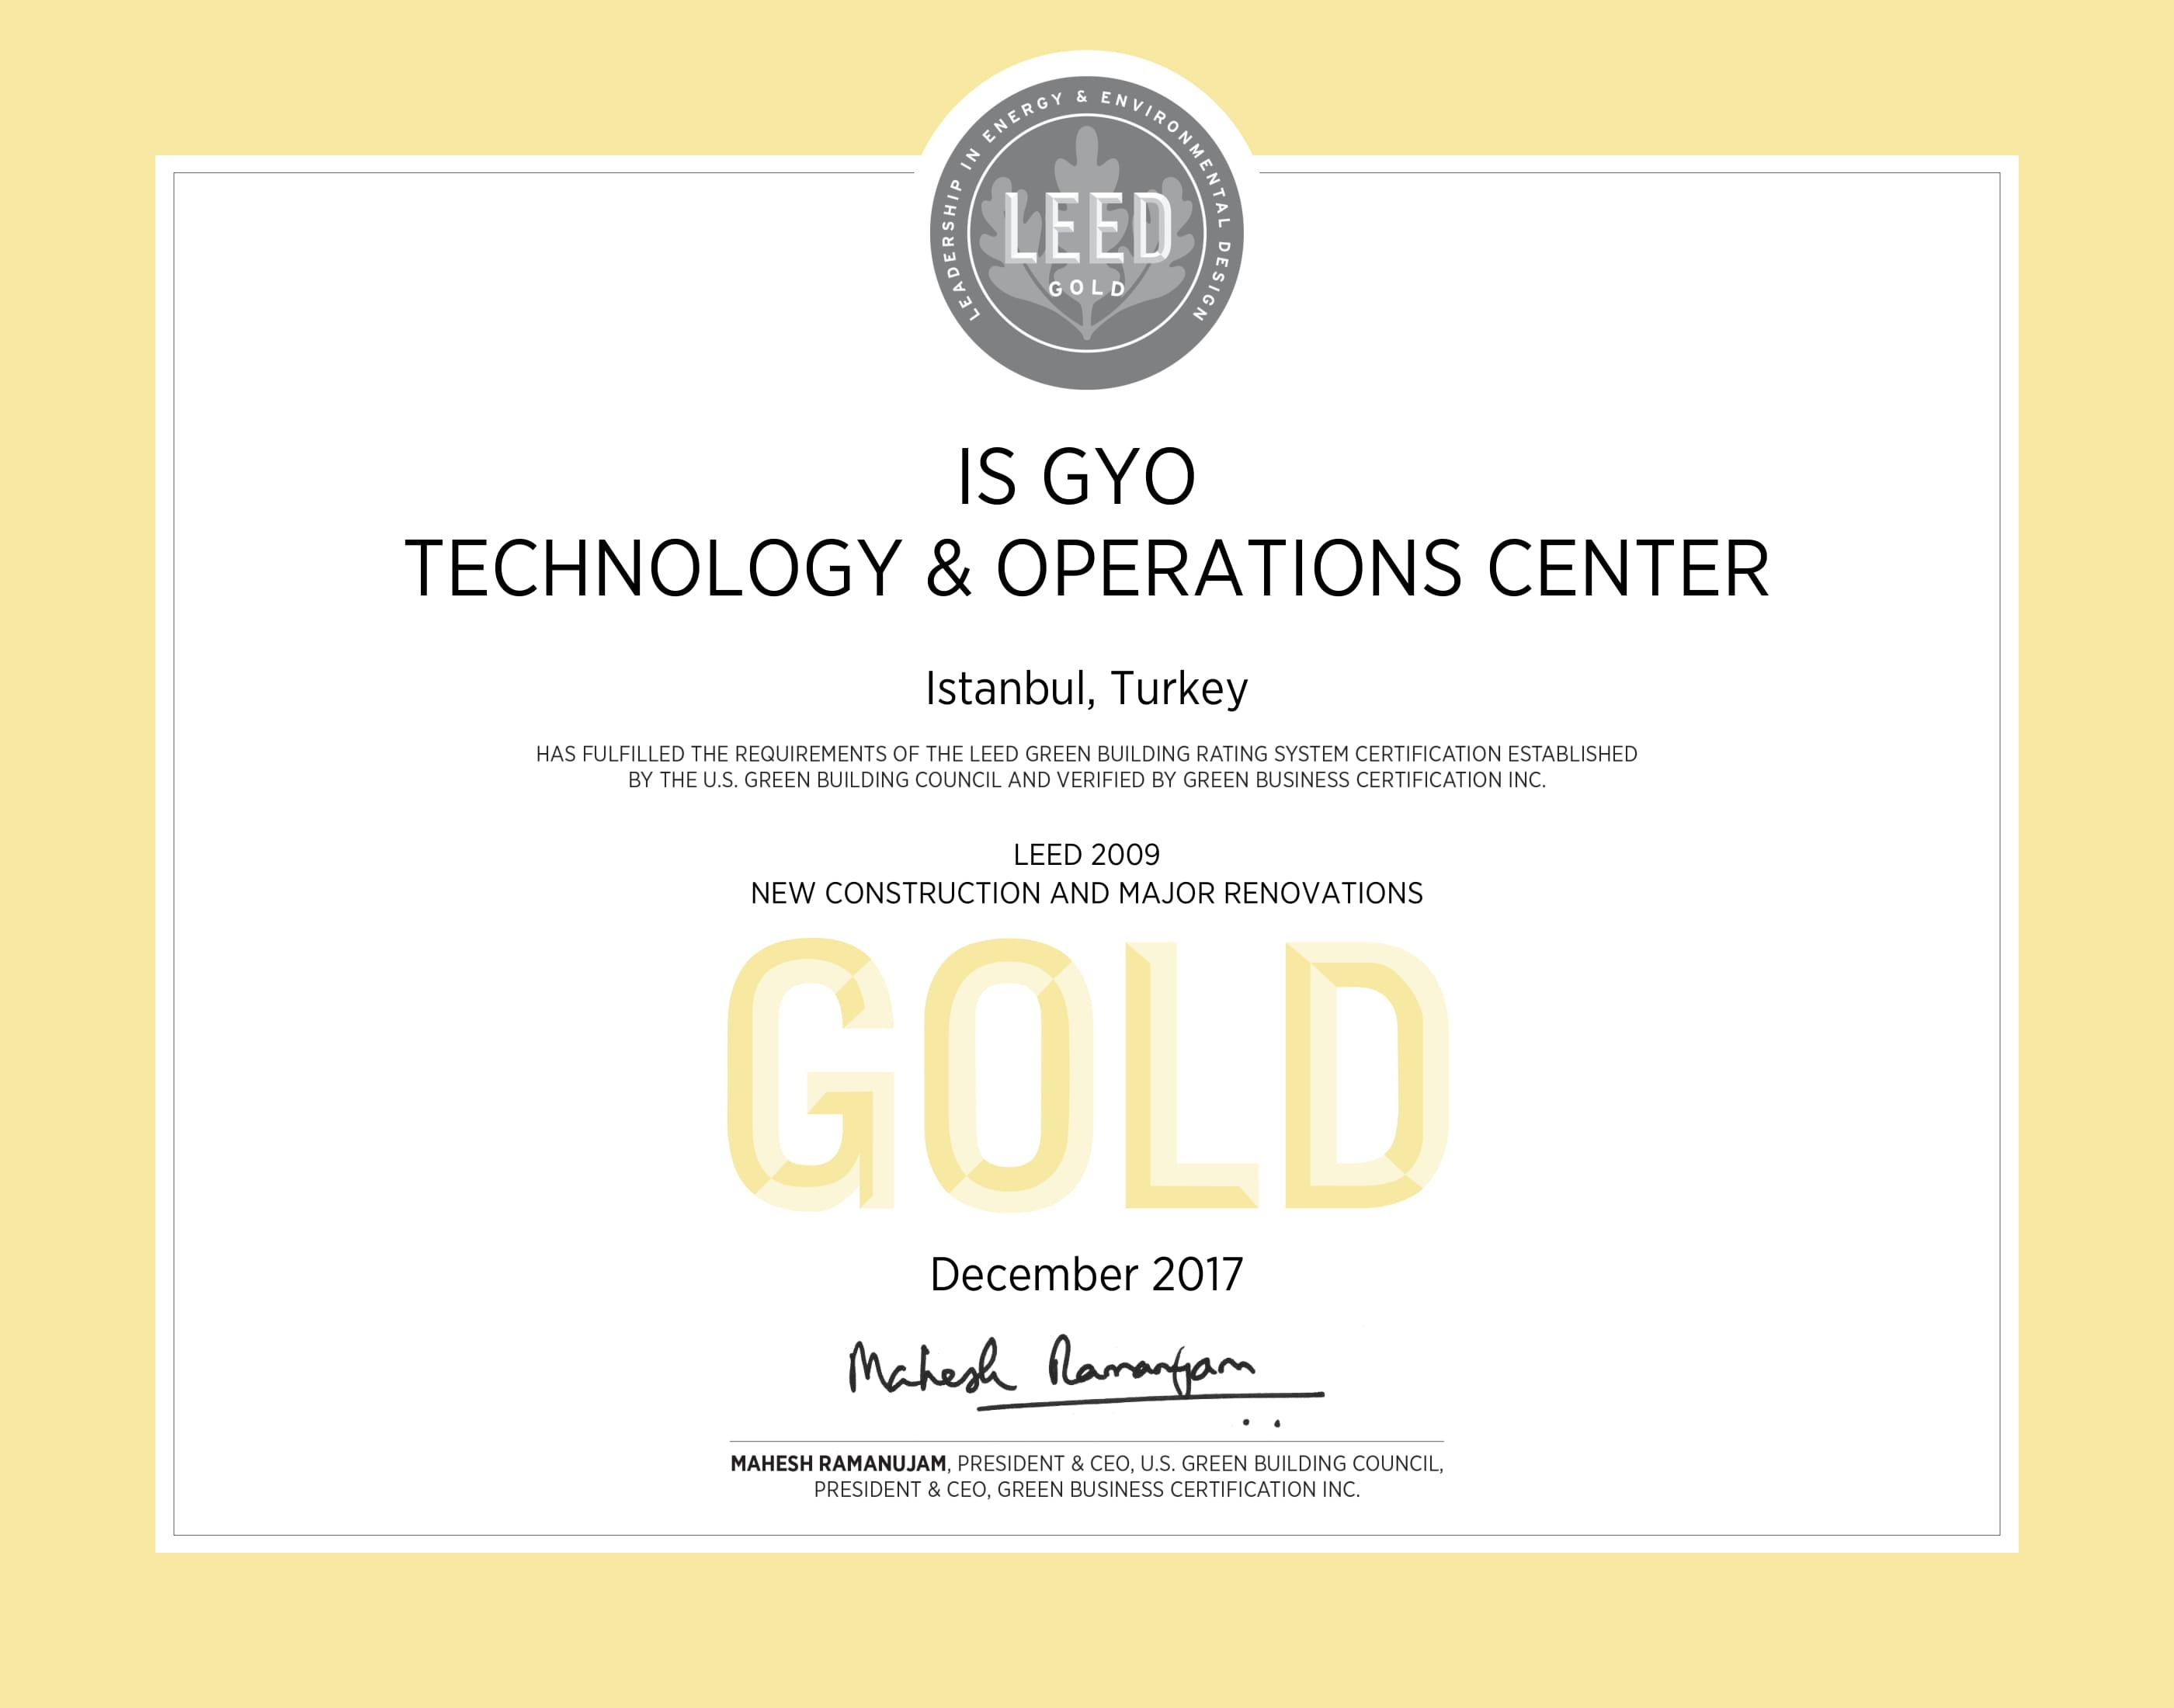 LEED Gold / Tuzla Teknoloji ve Operasyon Merkezi